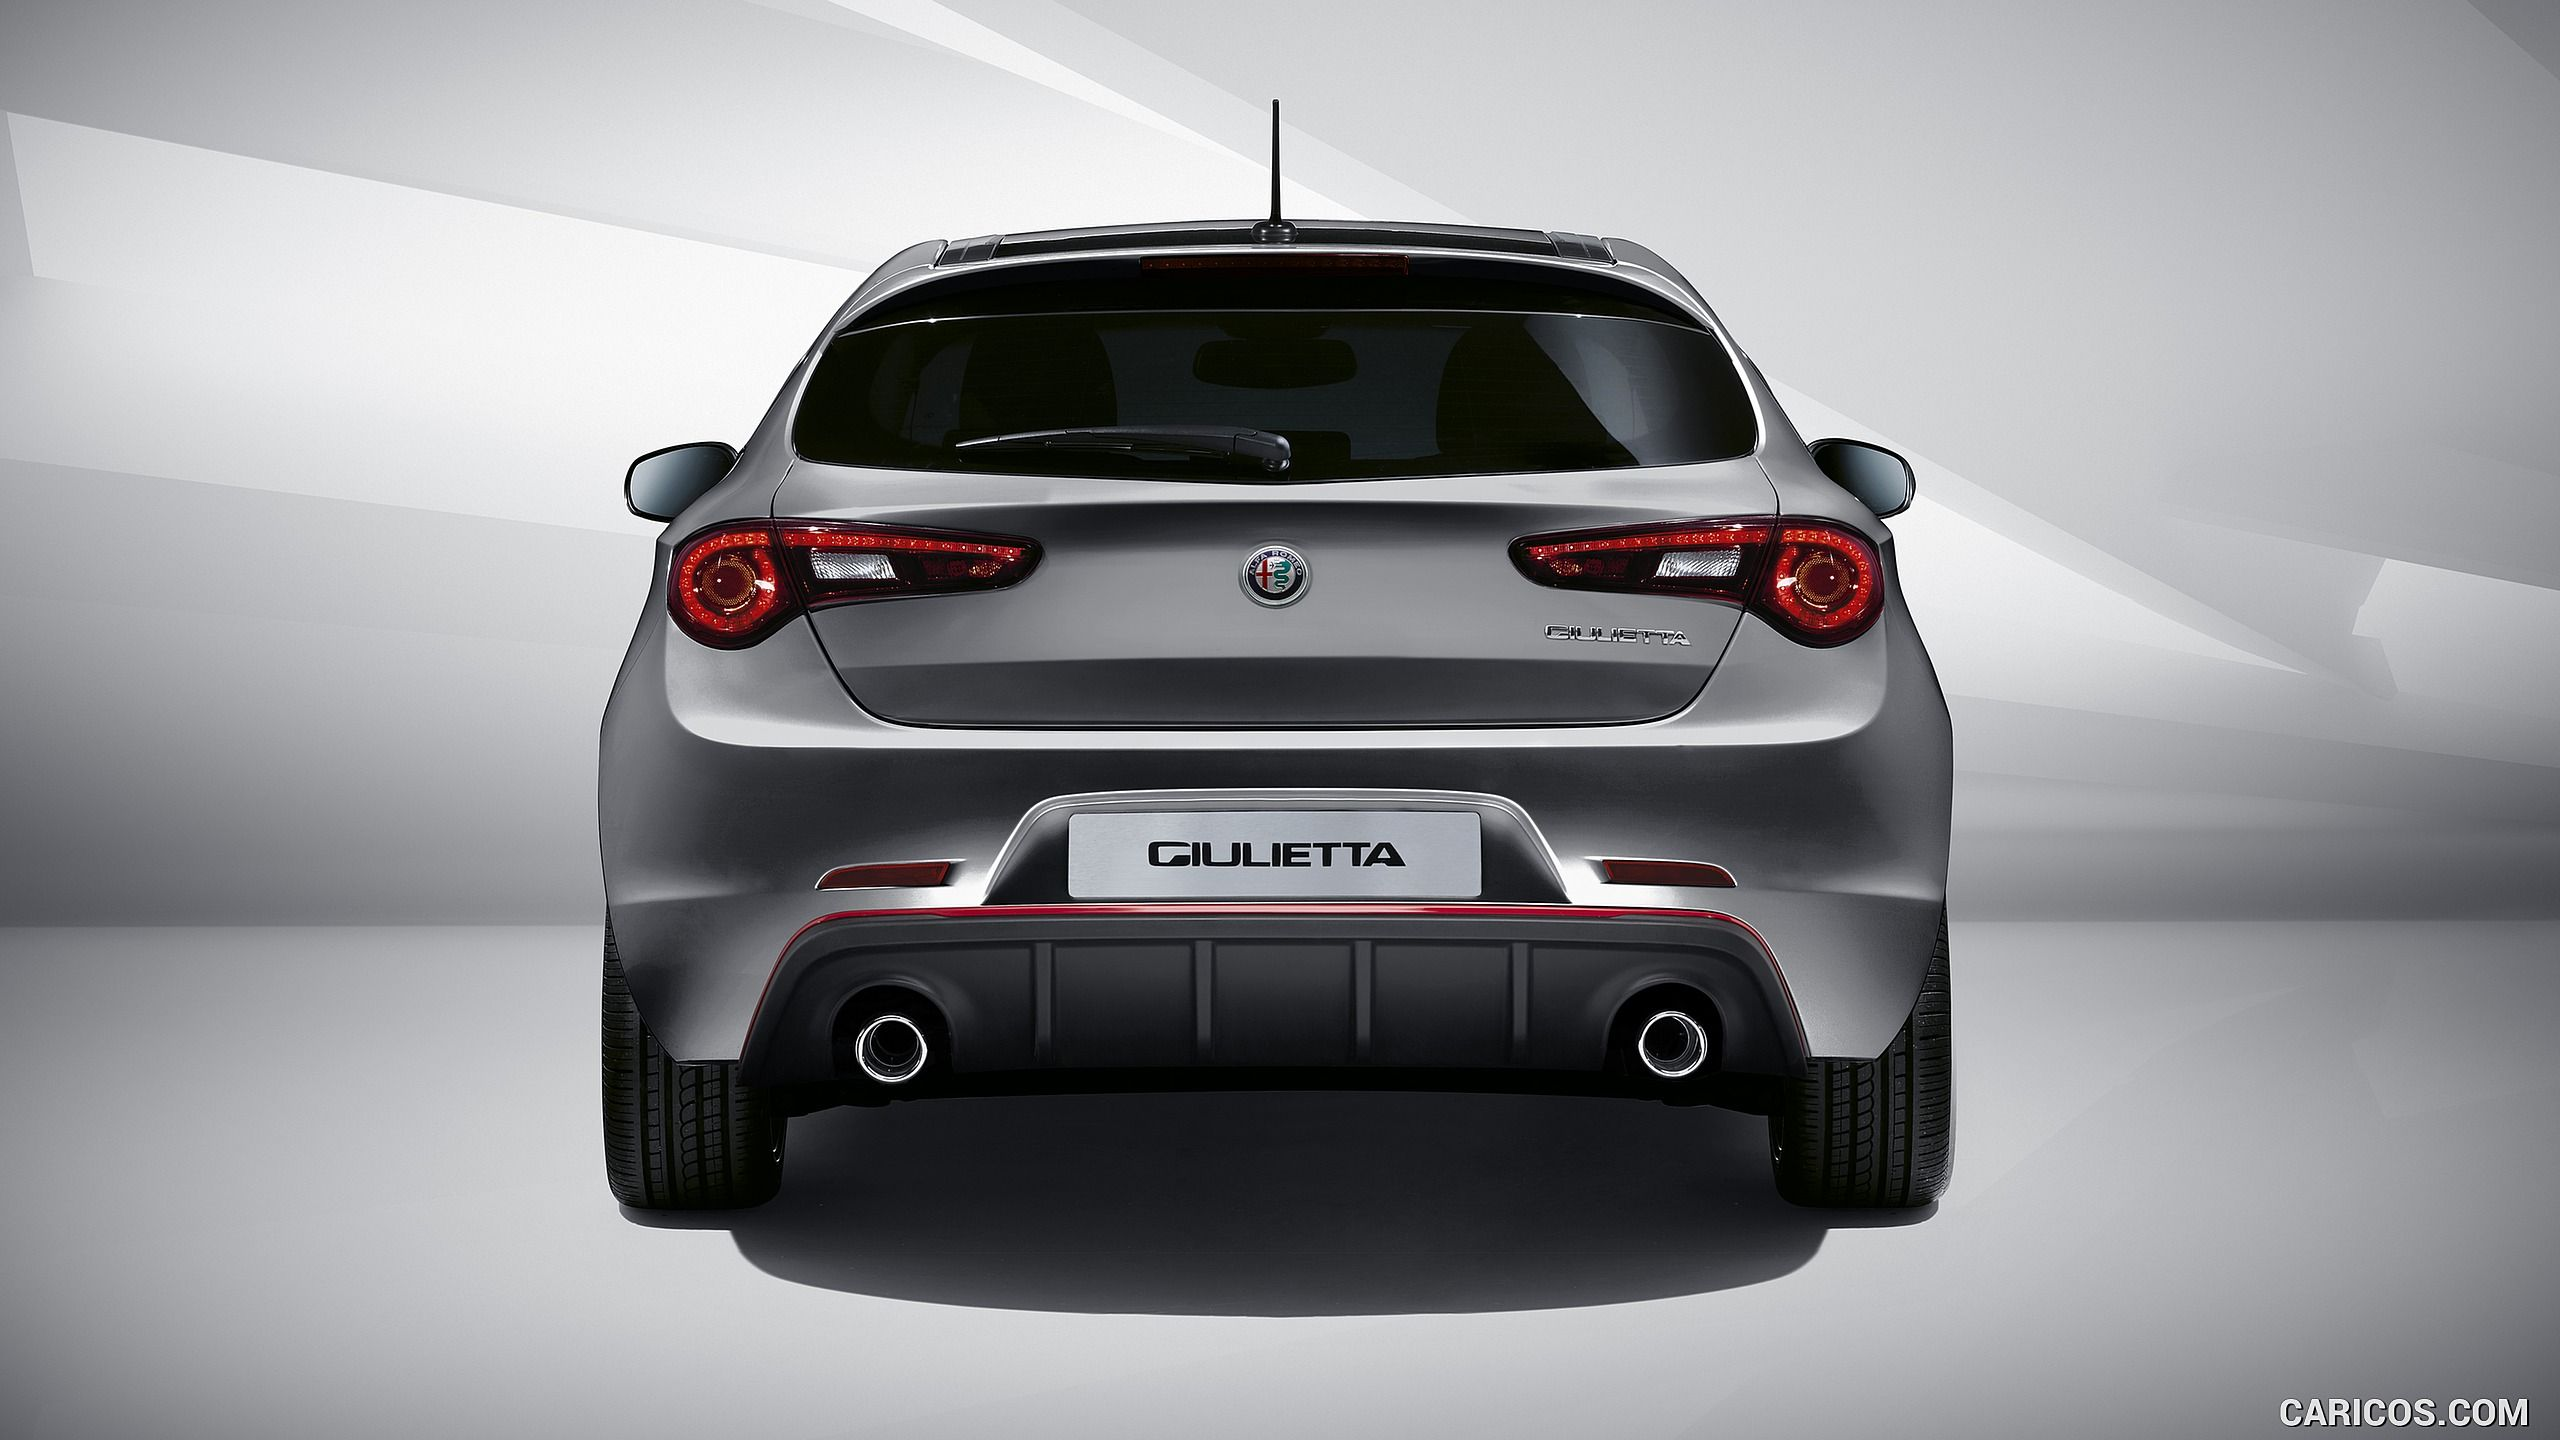 2017 Alfa Romeo Giulietta Wallpaper With Images Alfa Romeo